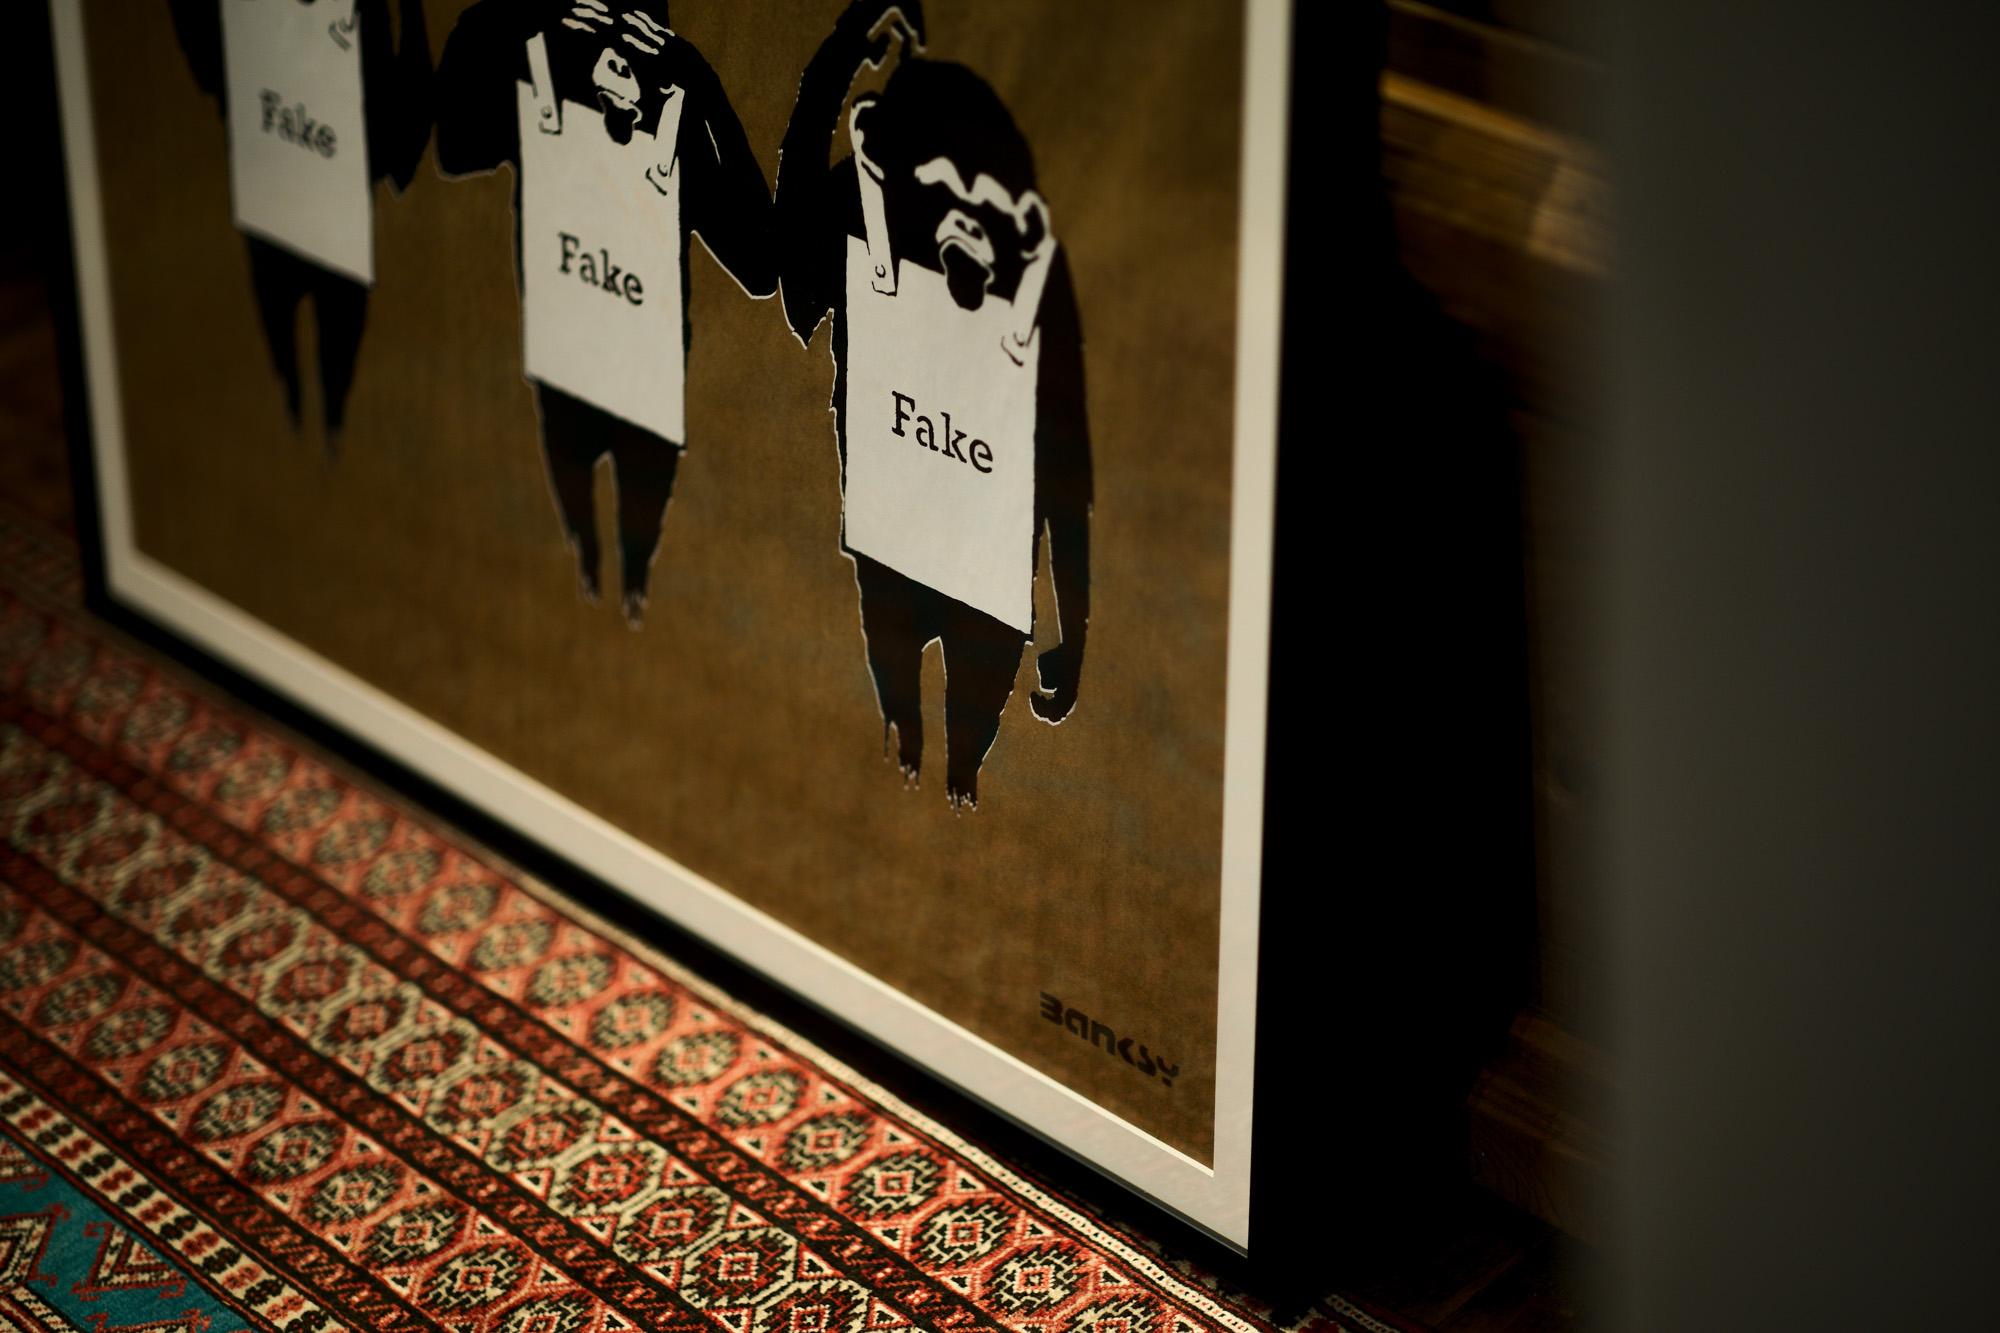 Not Not Banksy Not Not Banksy // Hear Not Not Banksy , See Not Not Banksy , Think Not Not Banksy  EDITION:AP 14/15 2018 ノットノットバンクシー ノットバンクシー サル 猿 さる Gallery D.N.A Japan February 2021 宮崎県 愛知 名古屋 Alto e Diritto altoediritto アルトエデリット